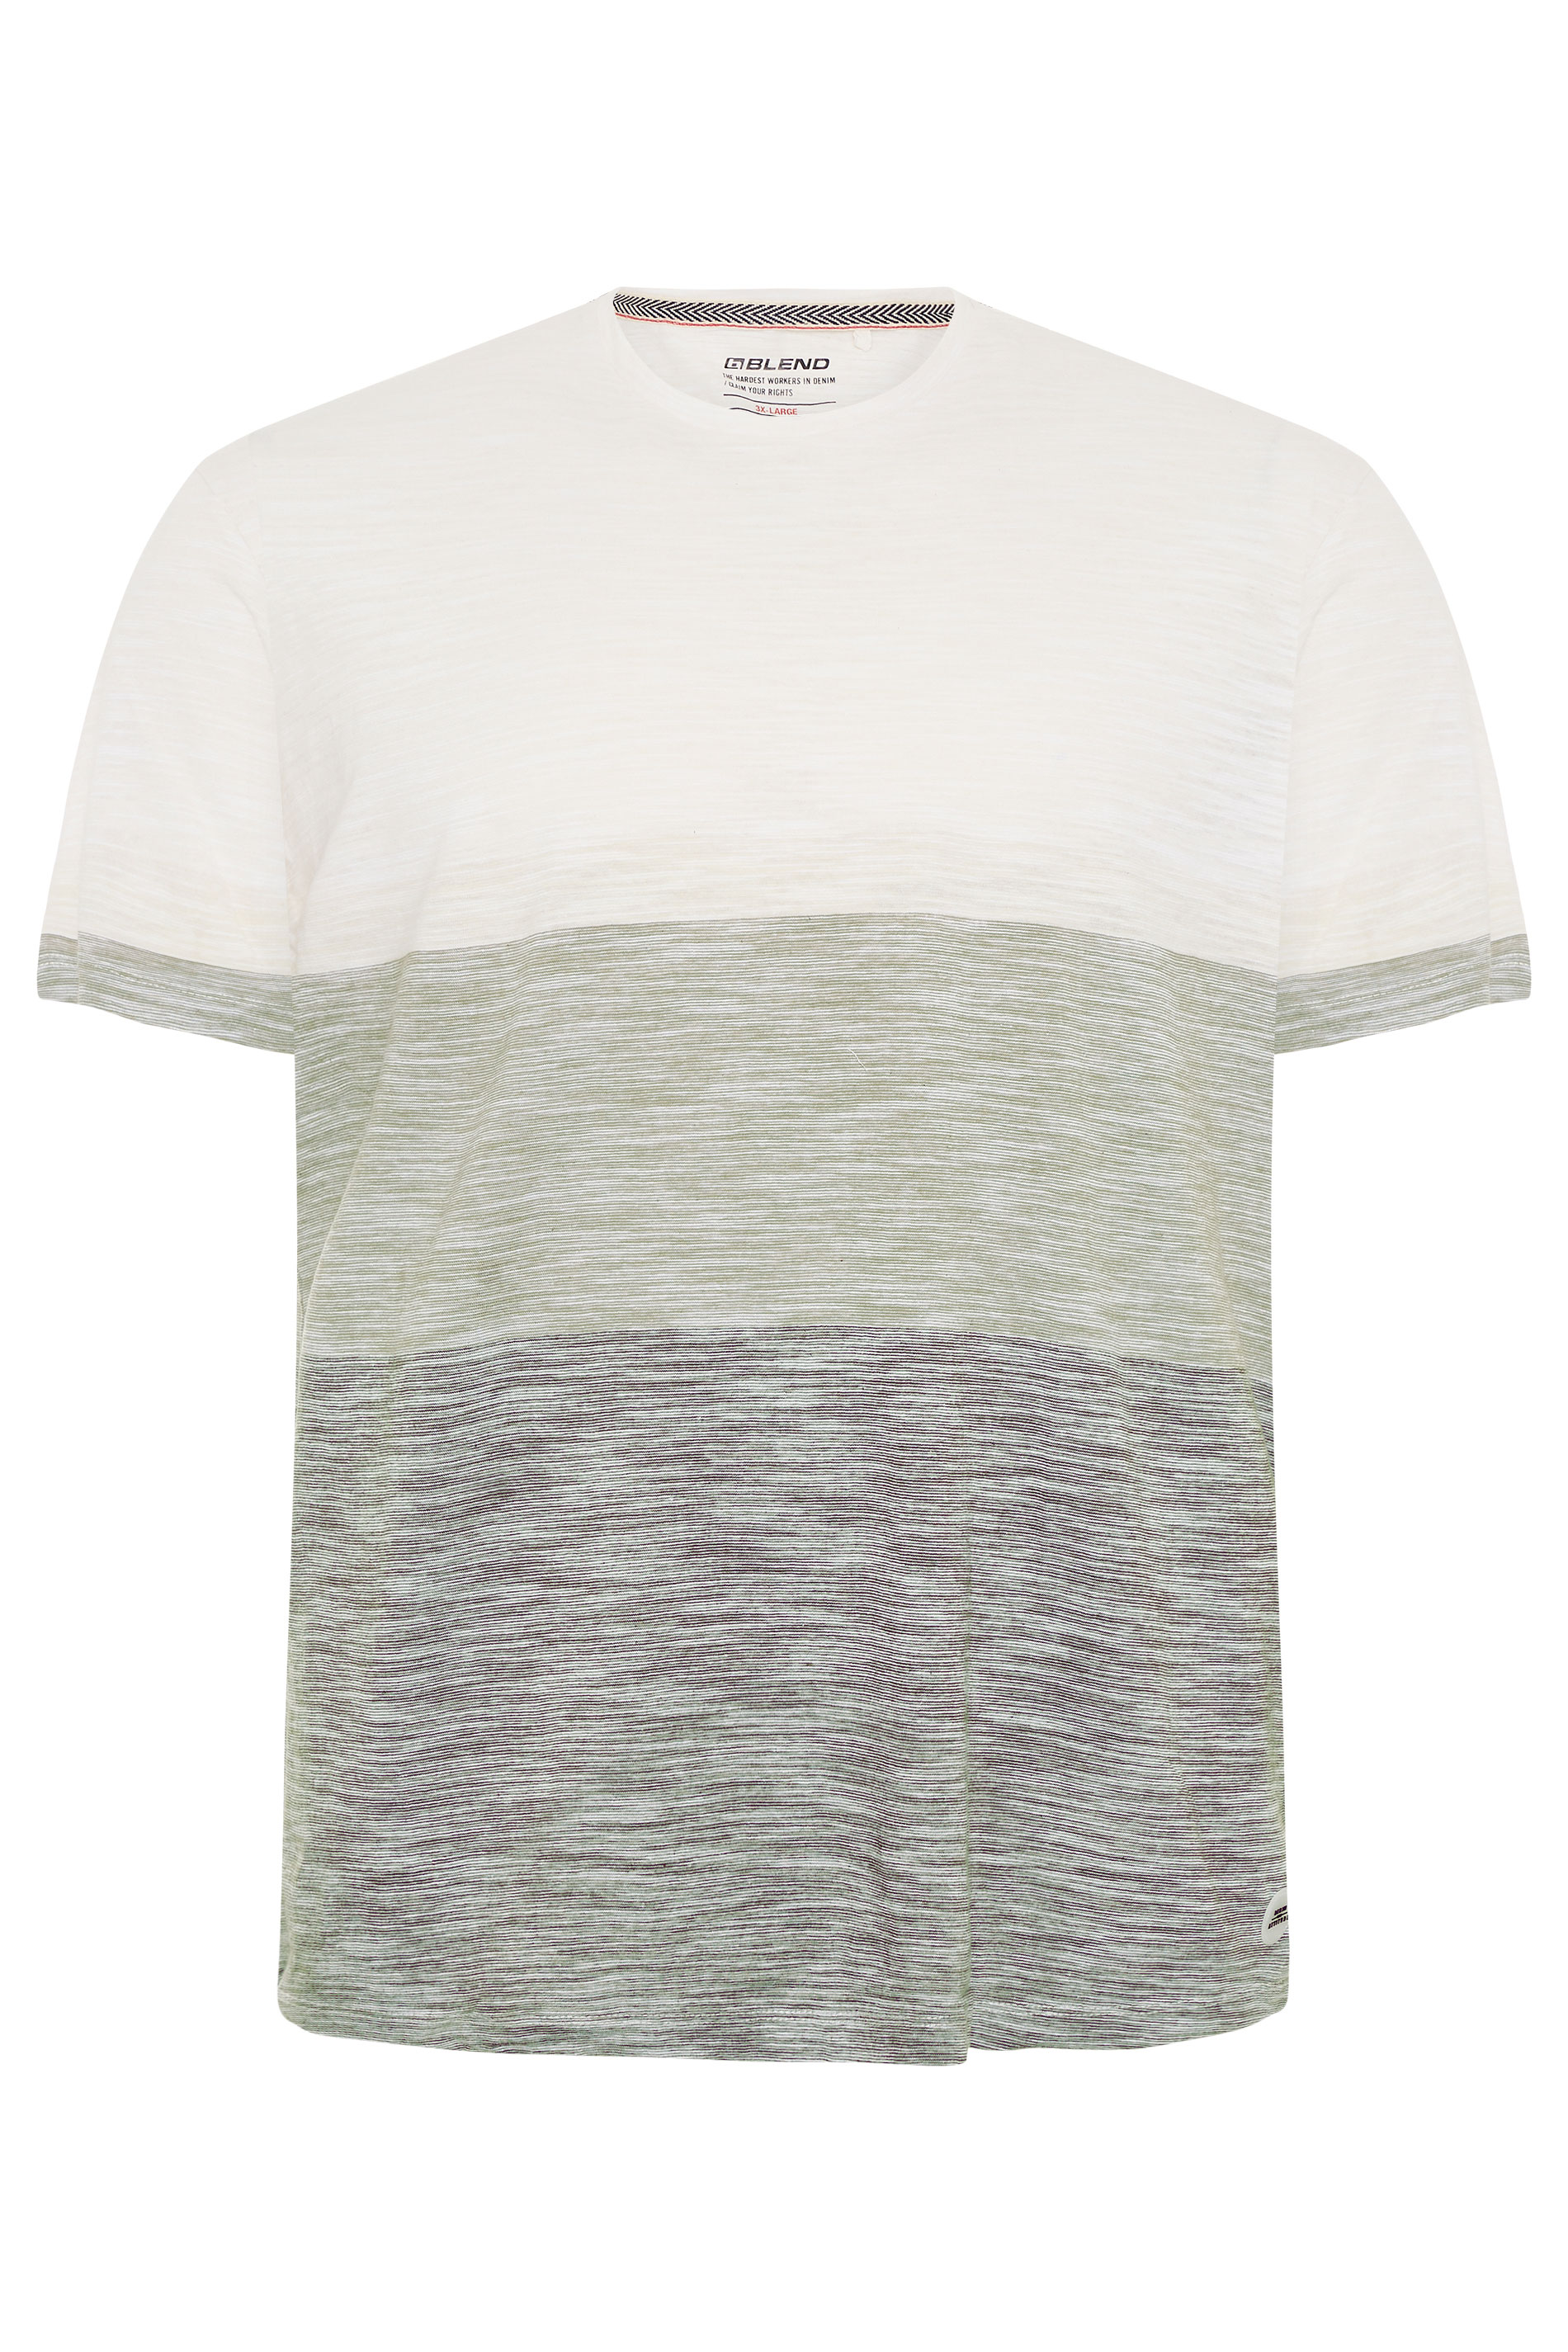 BLEND Graues Colour Block T-Shirt aus Baumwolle